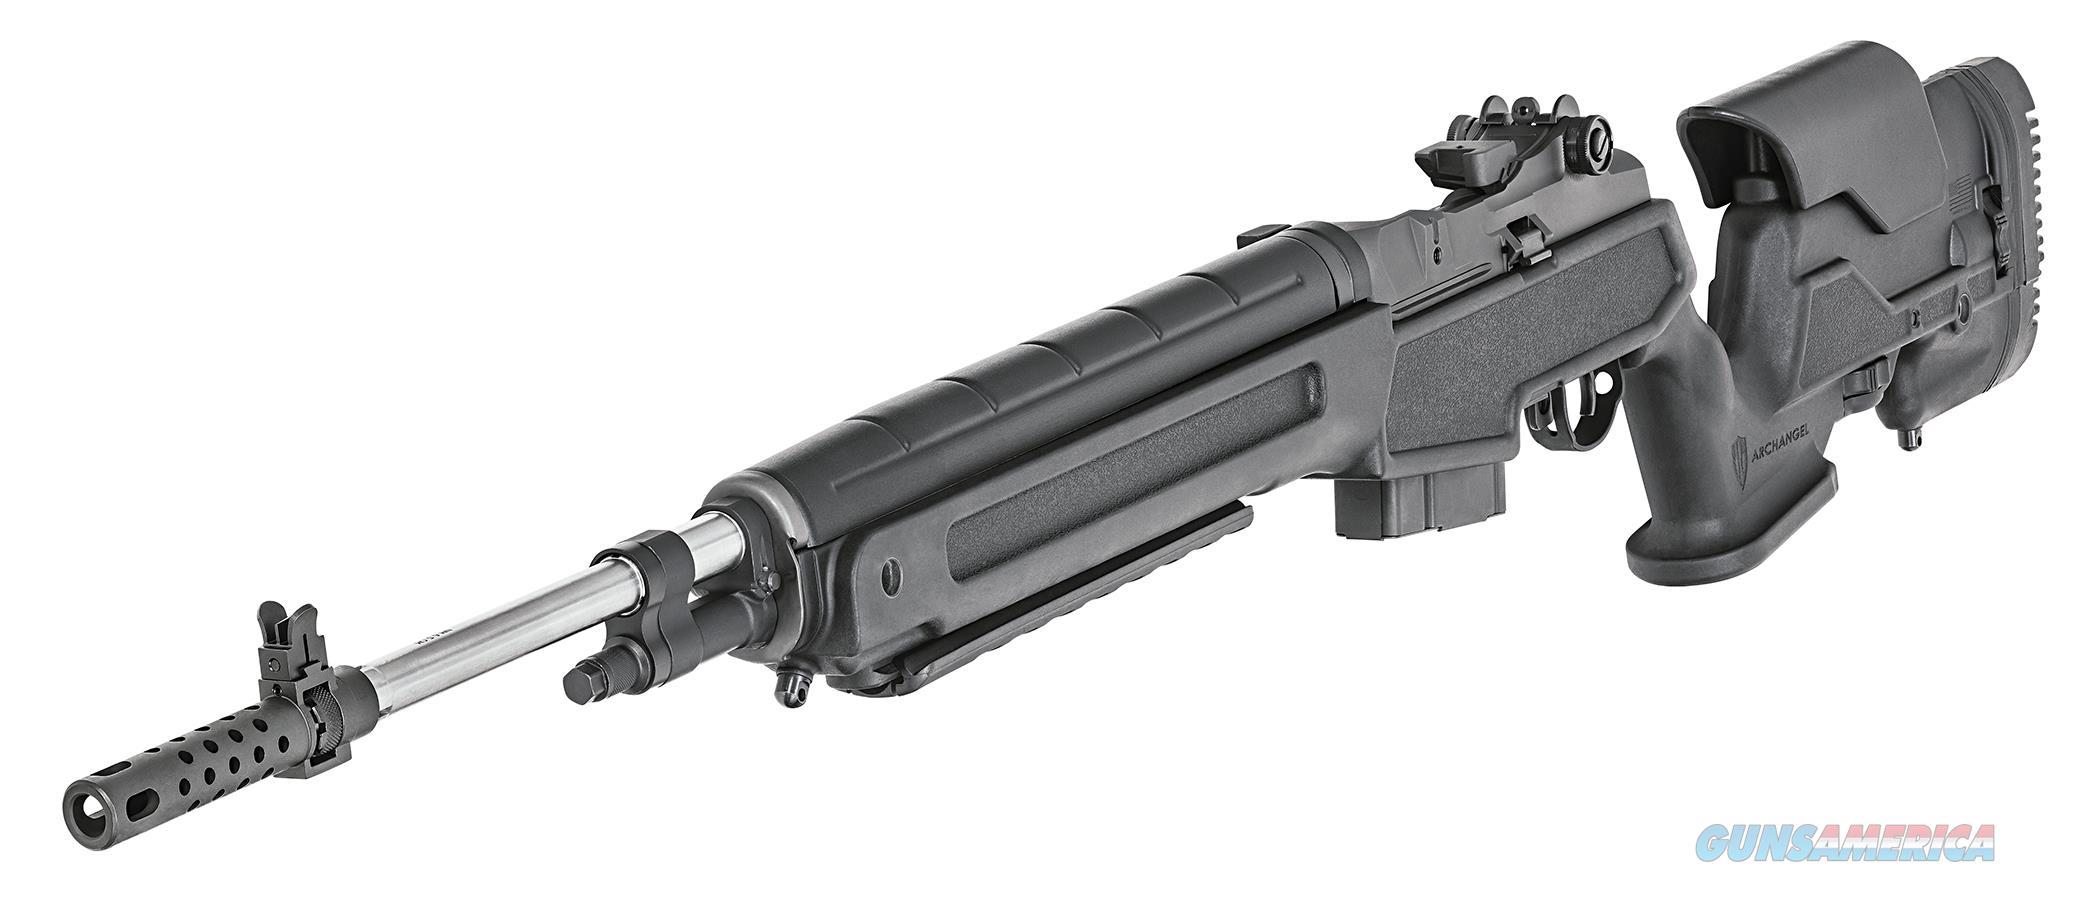 SPRINGFIELD M1A 6.5 CREEDMOOR NEW MODEL NEW IN BOX  Guns > Rifles > Springfield Armory Rifles > M1A/M14